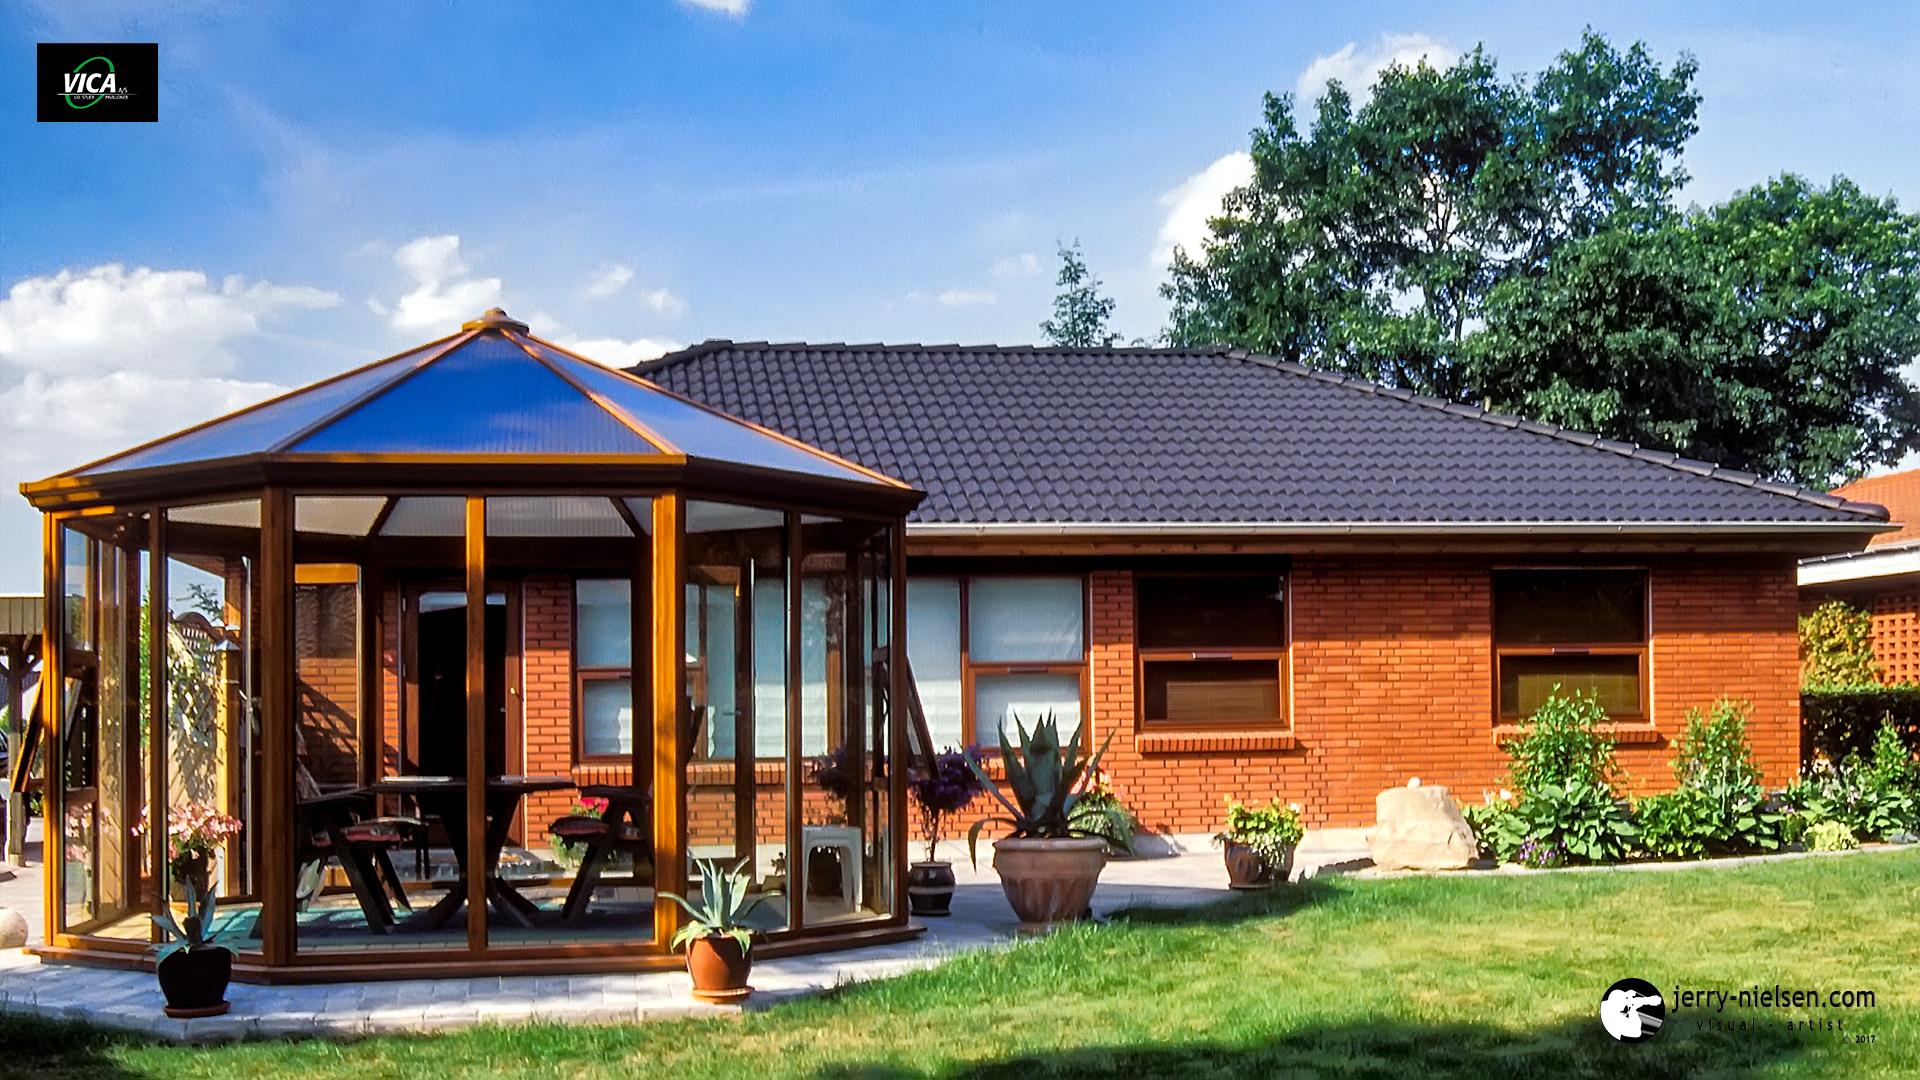 VICA Brown Pavilion